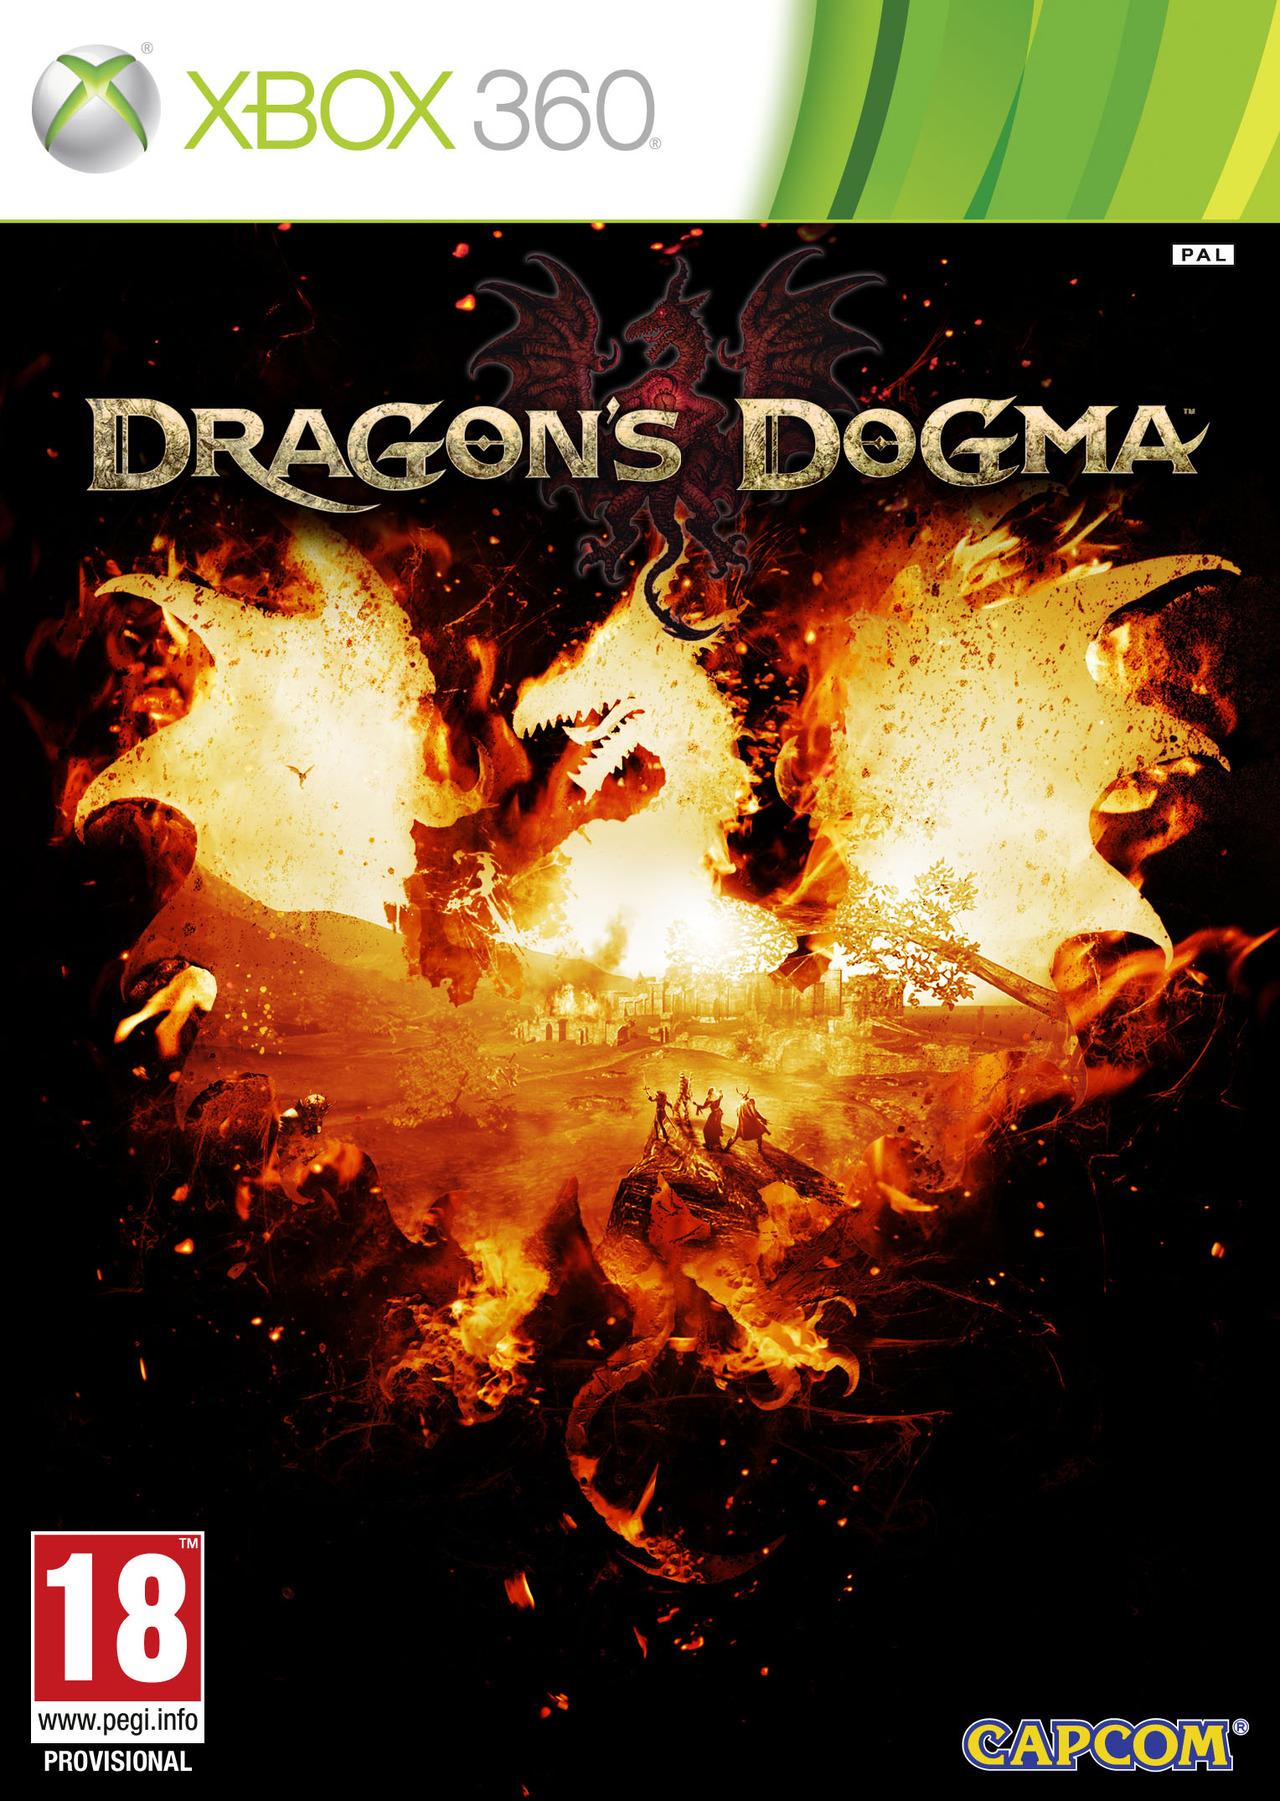 Dragon-sDogma 360 Jaquette 003